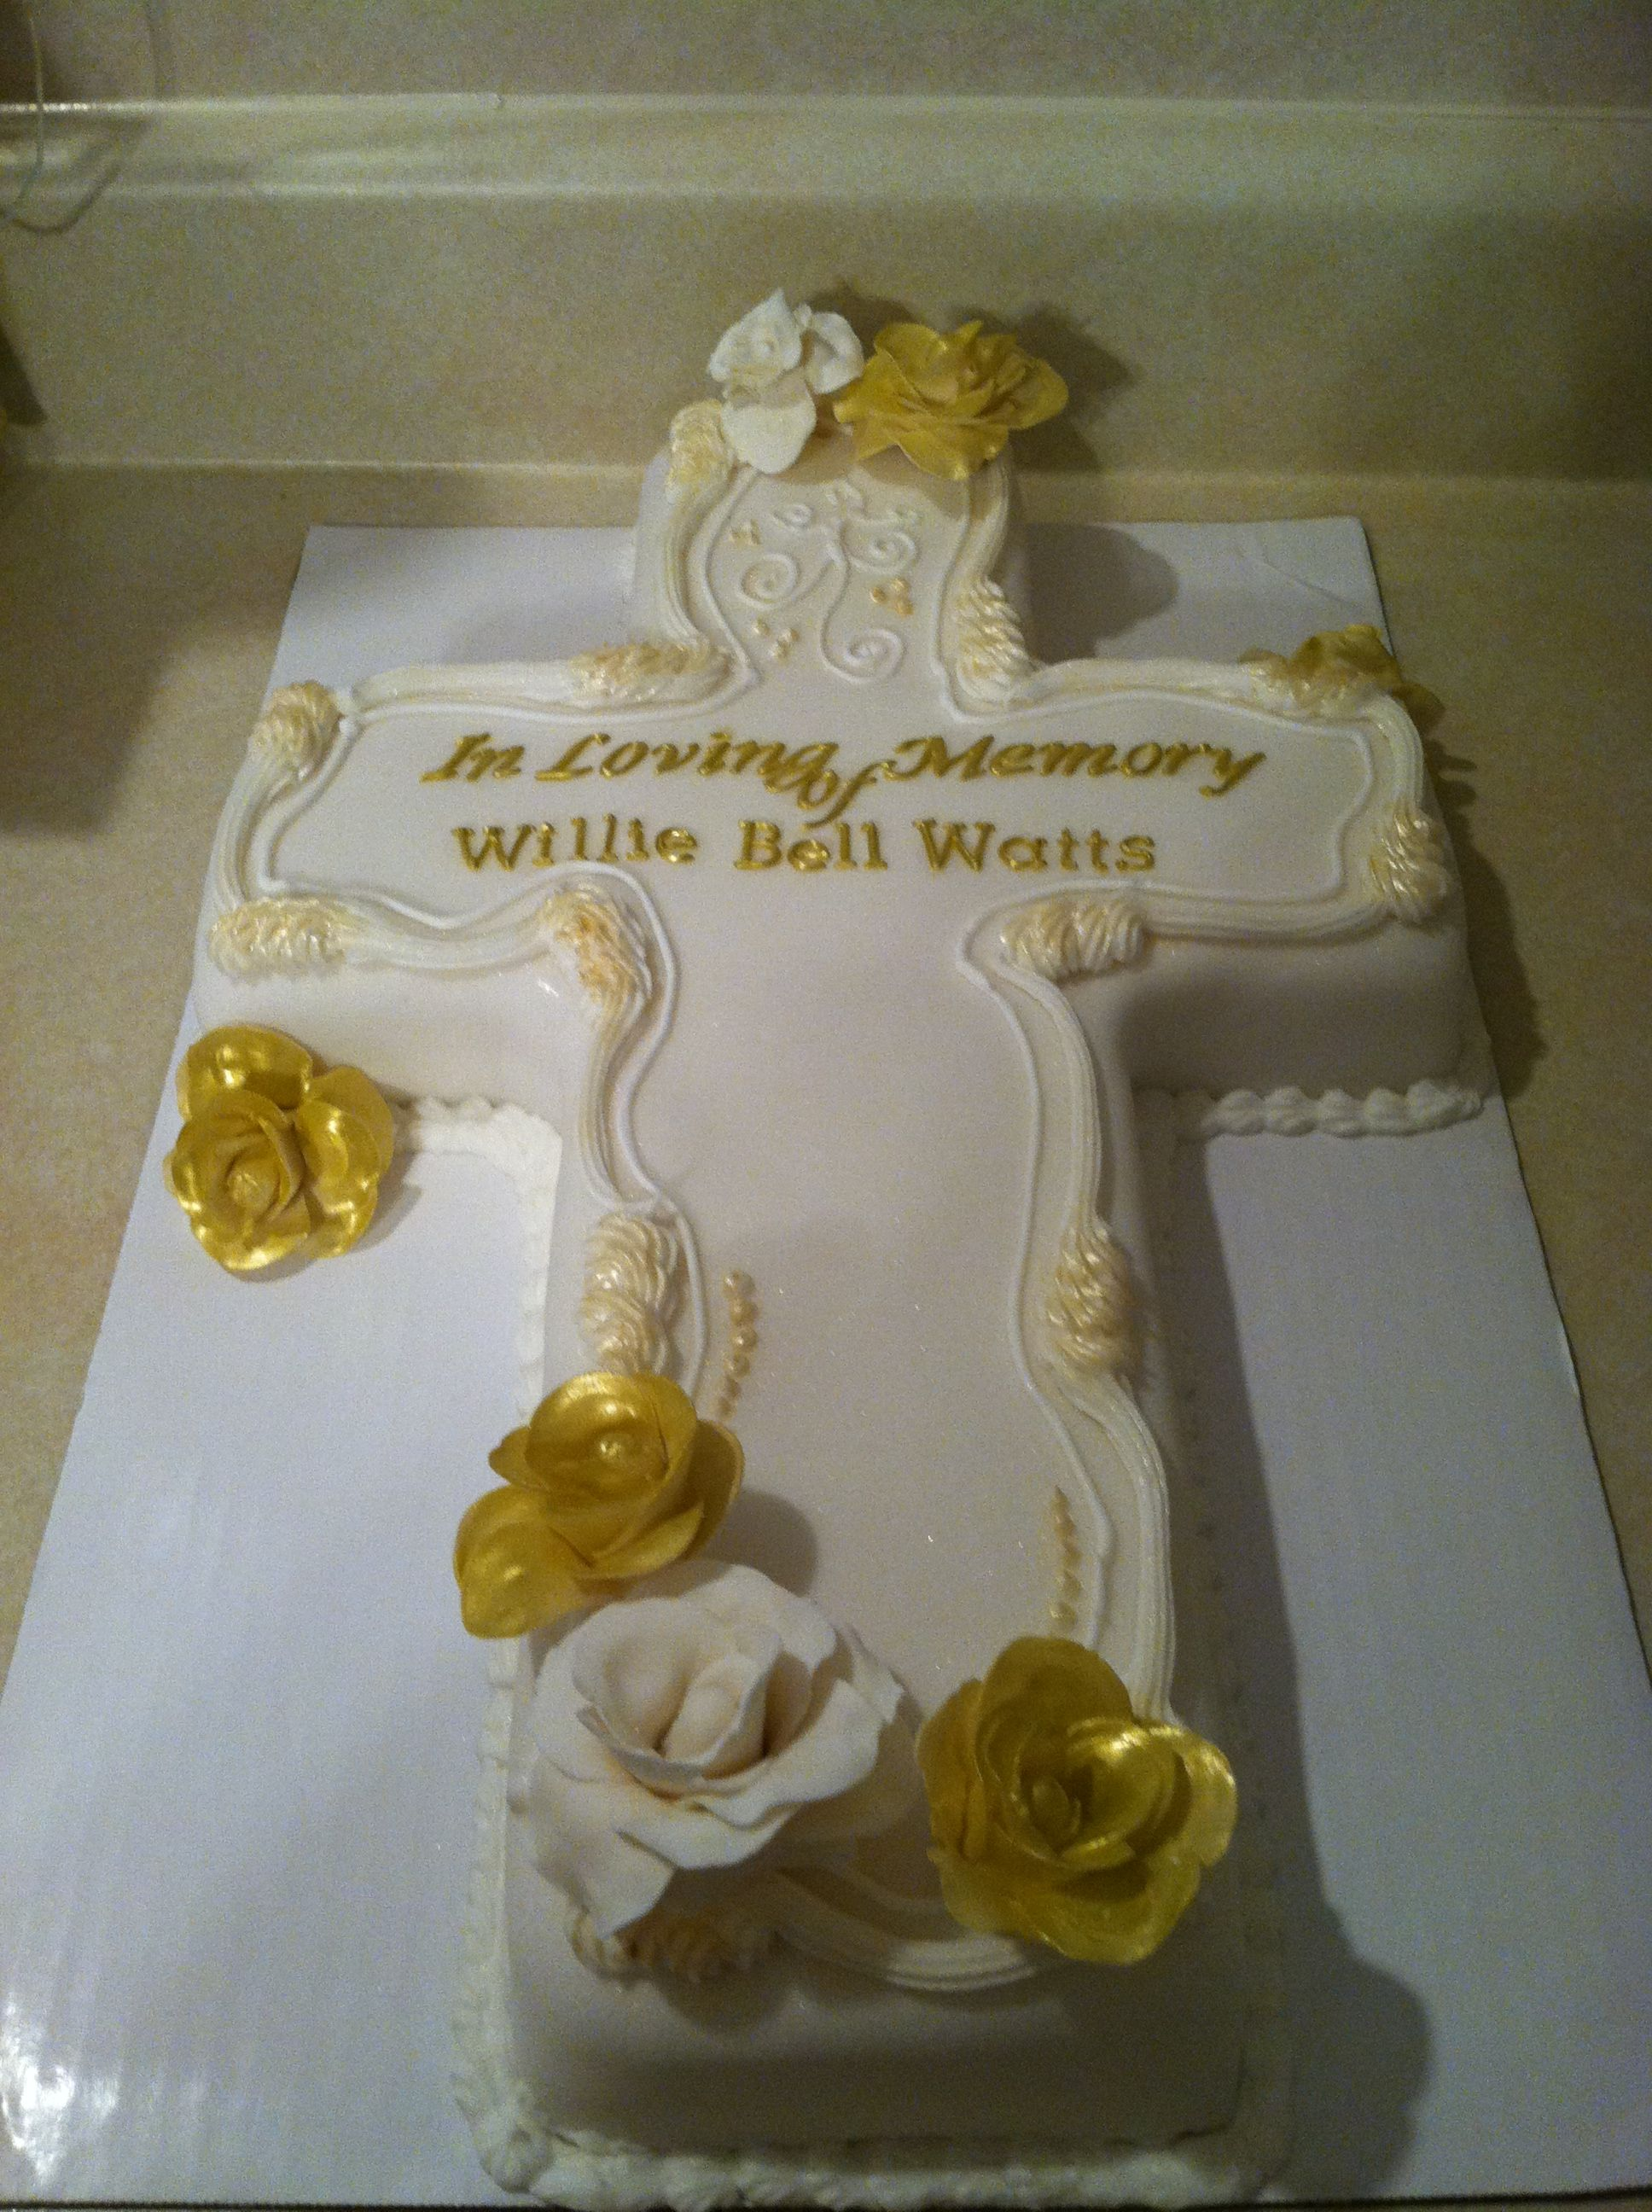 Memorial Cross Cake Baptism Cake Cross Cakes Confirmation Cakes